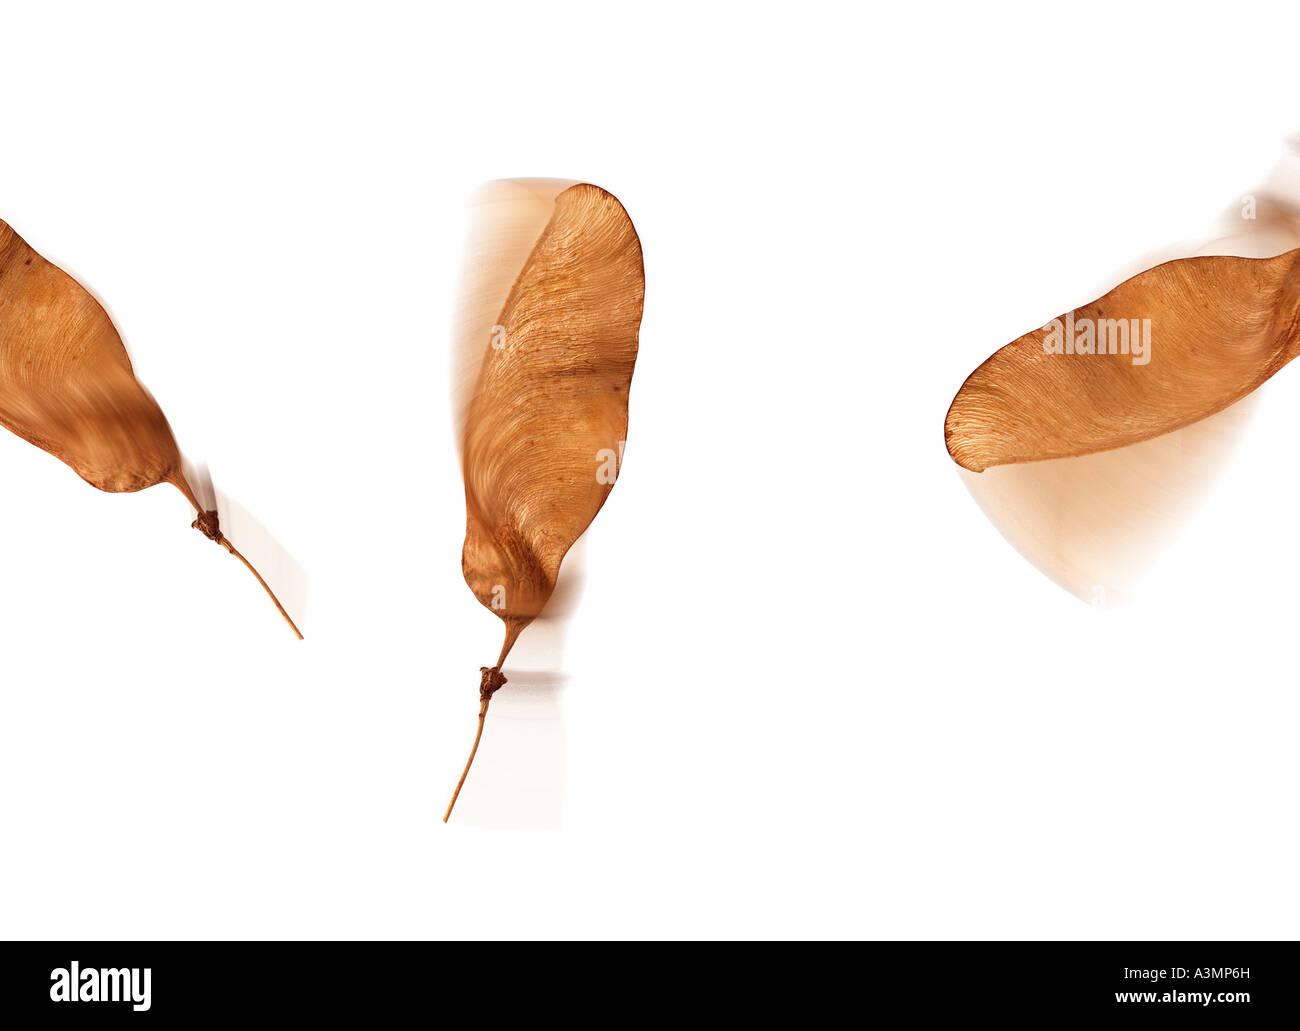 Flying seeds - Stock Image